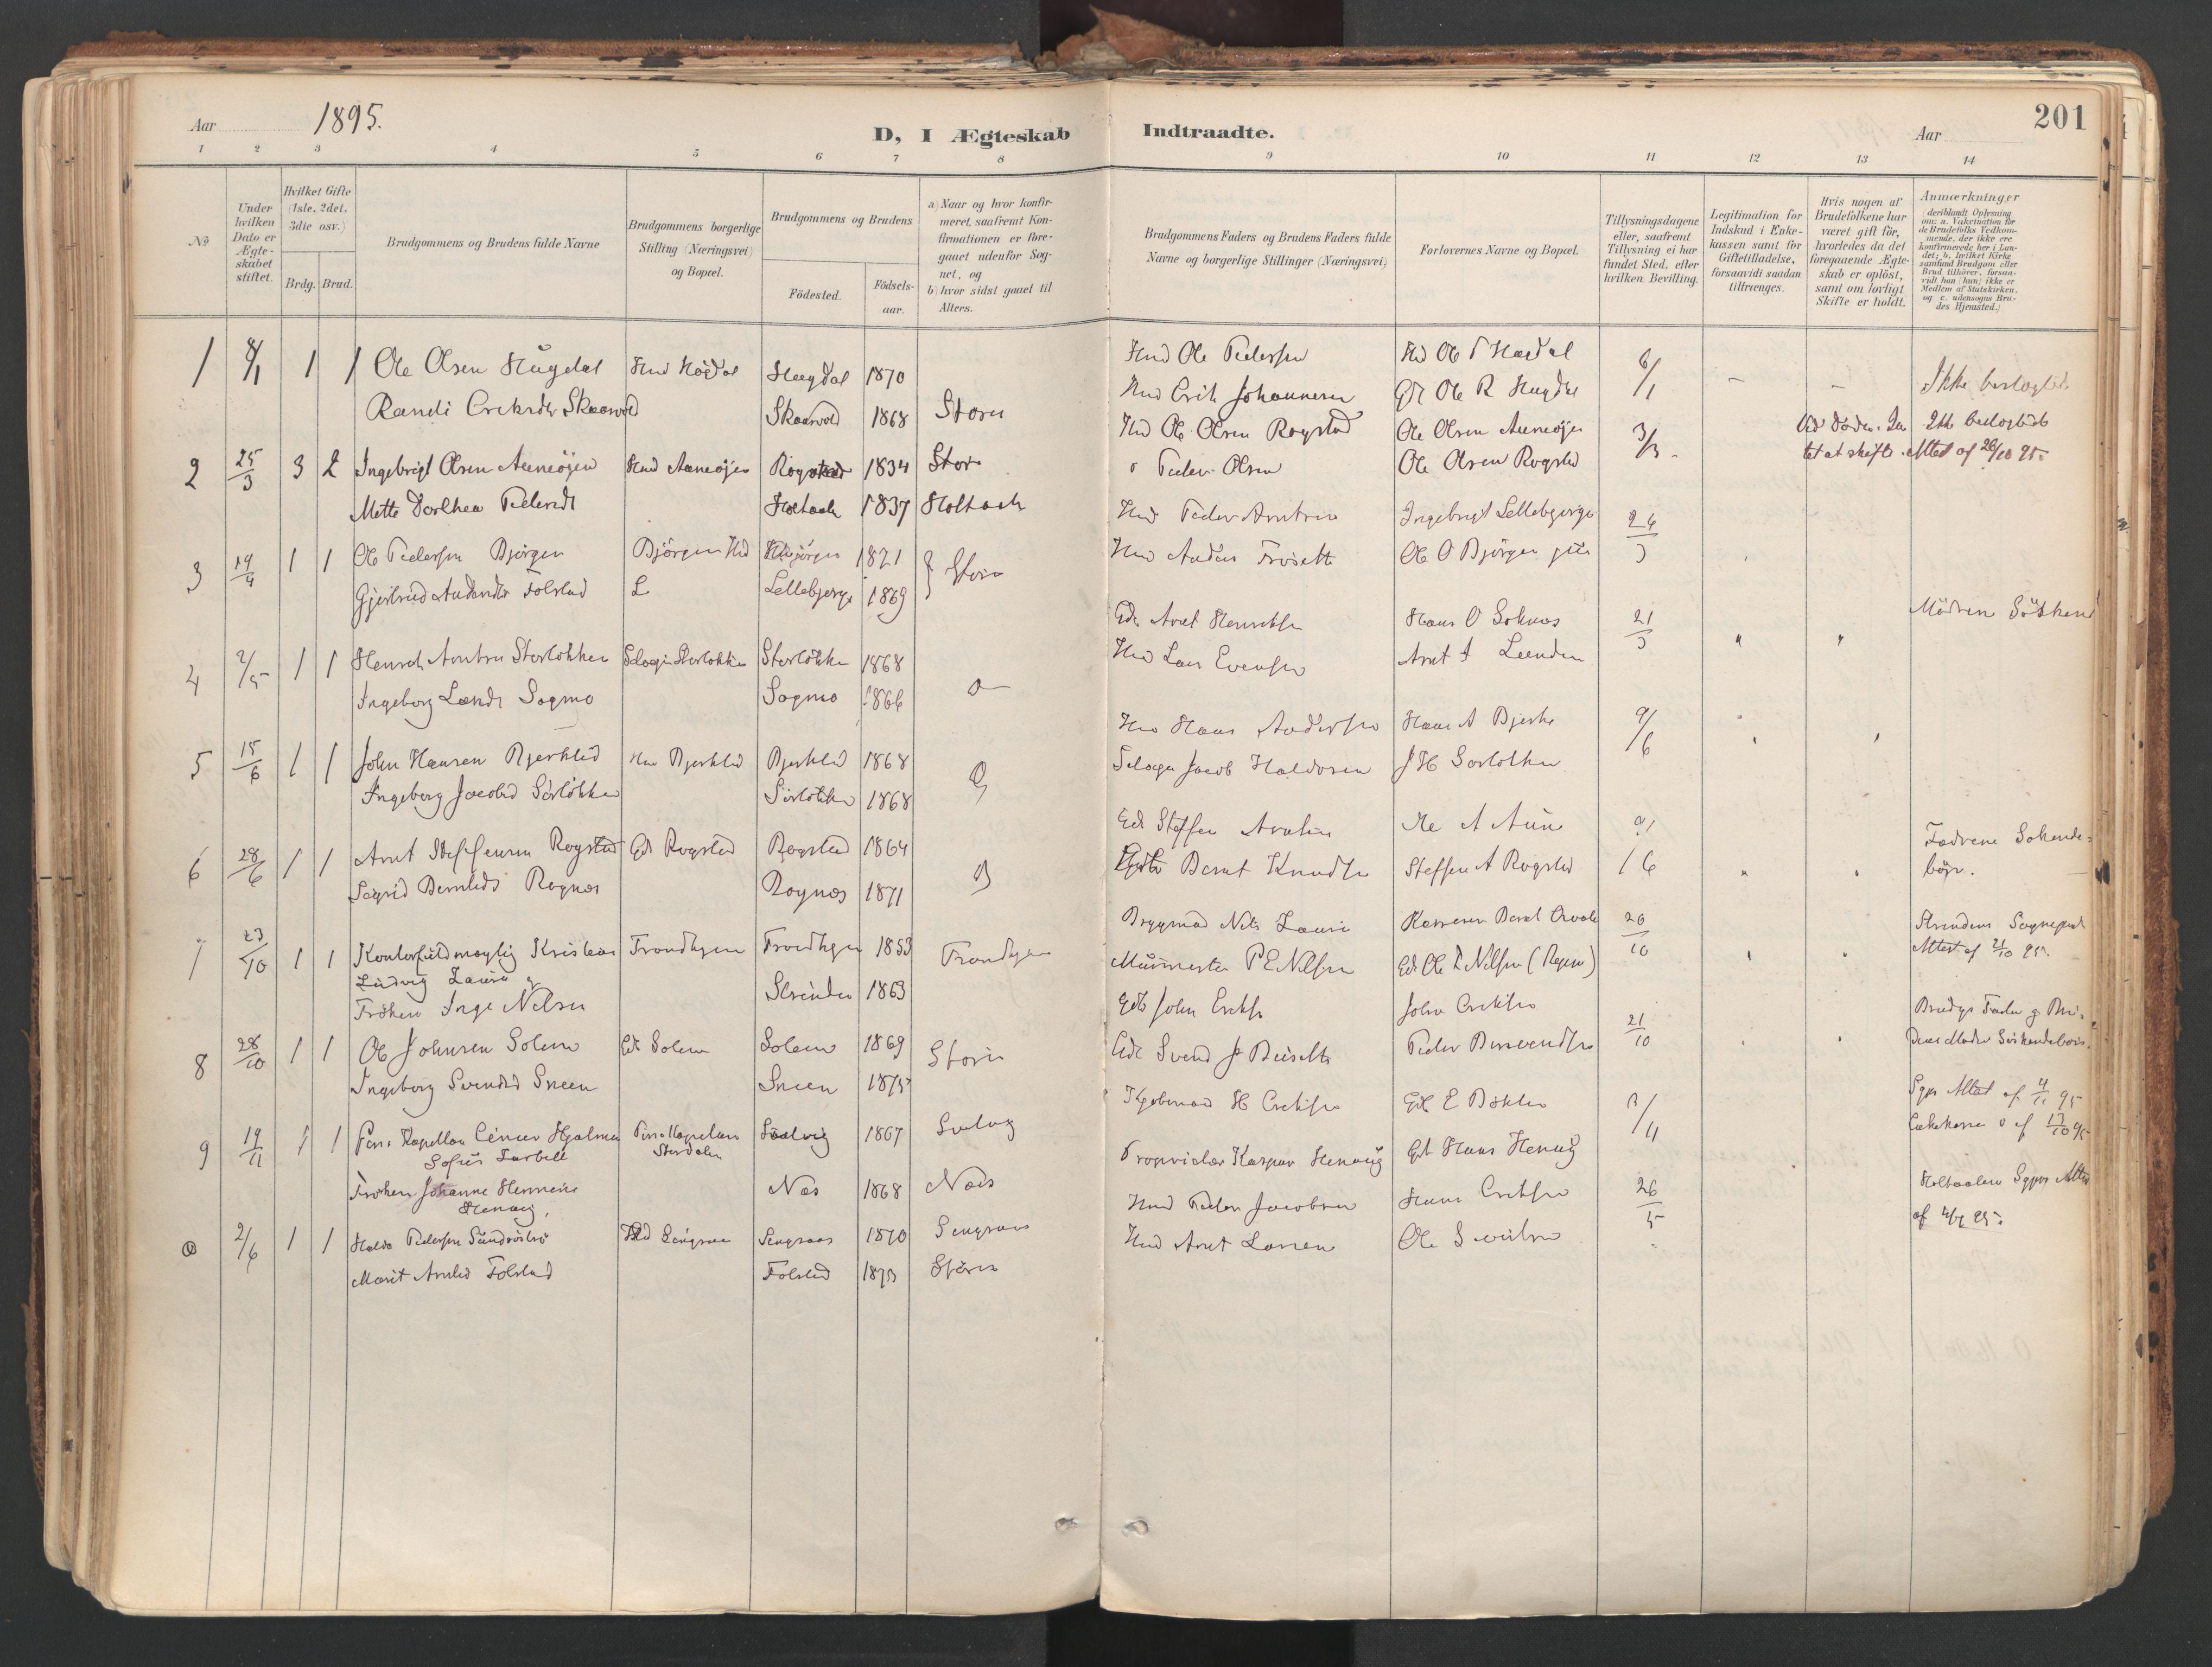 SAT, Ministerialprotokoller, klokkerbøker og fødselsregistre - Sør-Trøndelag, 687/L1004: Parish register (official) no. 687A10, 1891-1923, p. 201